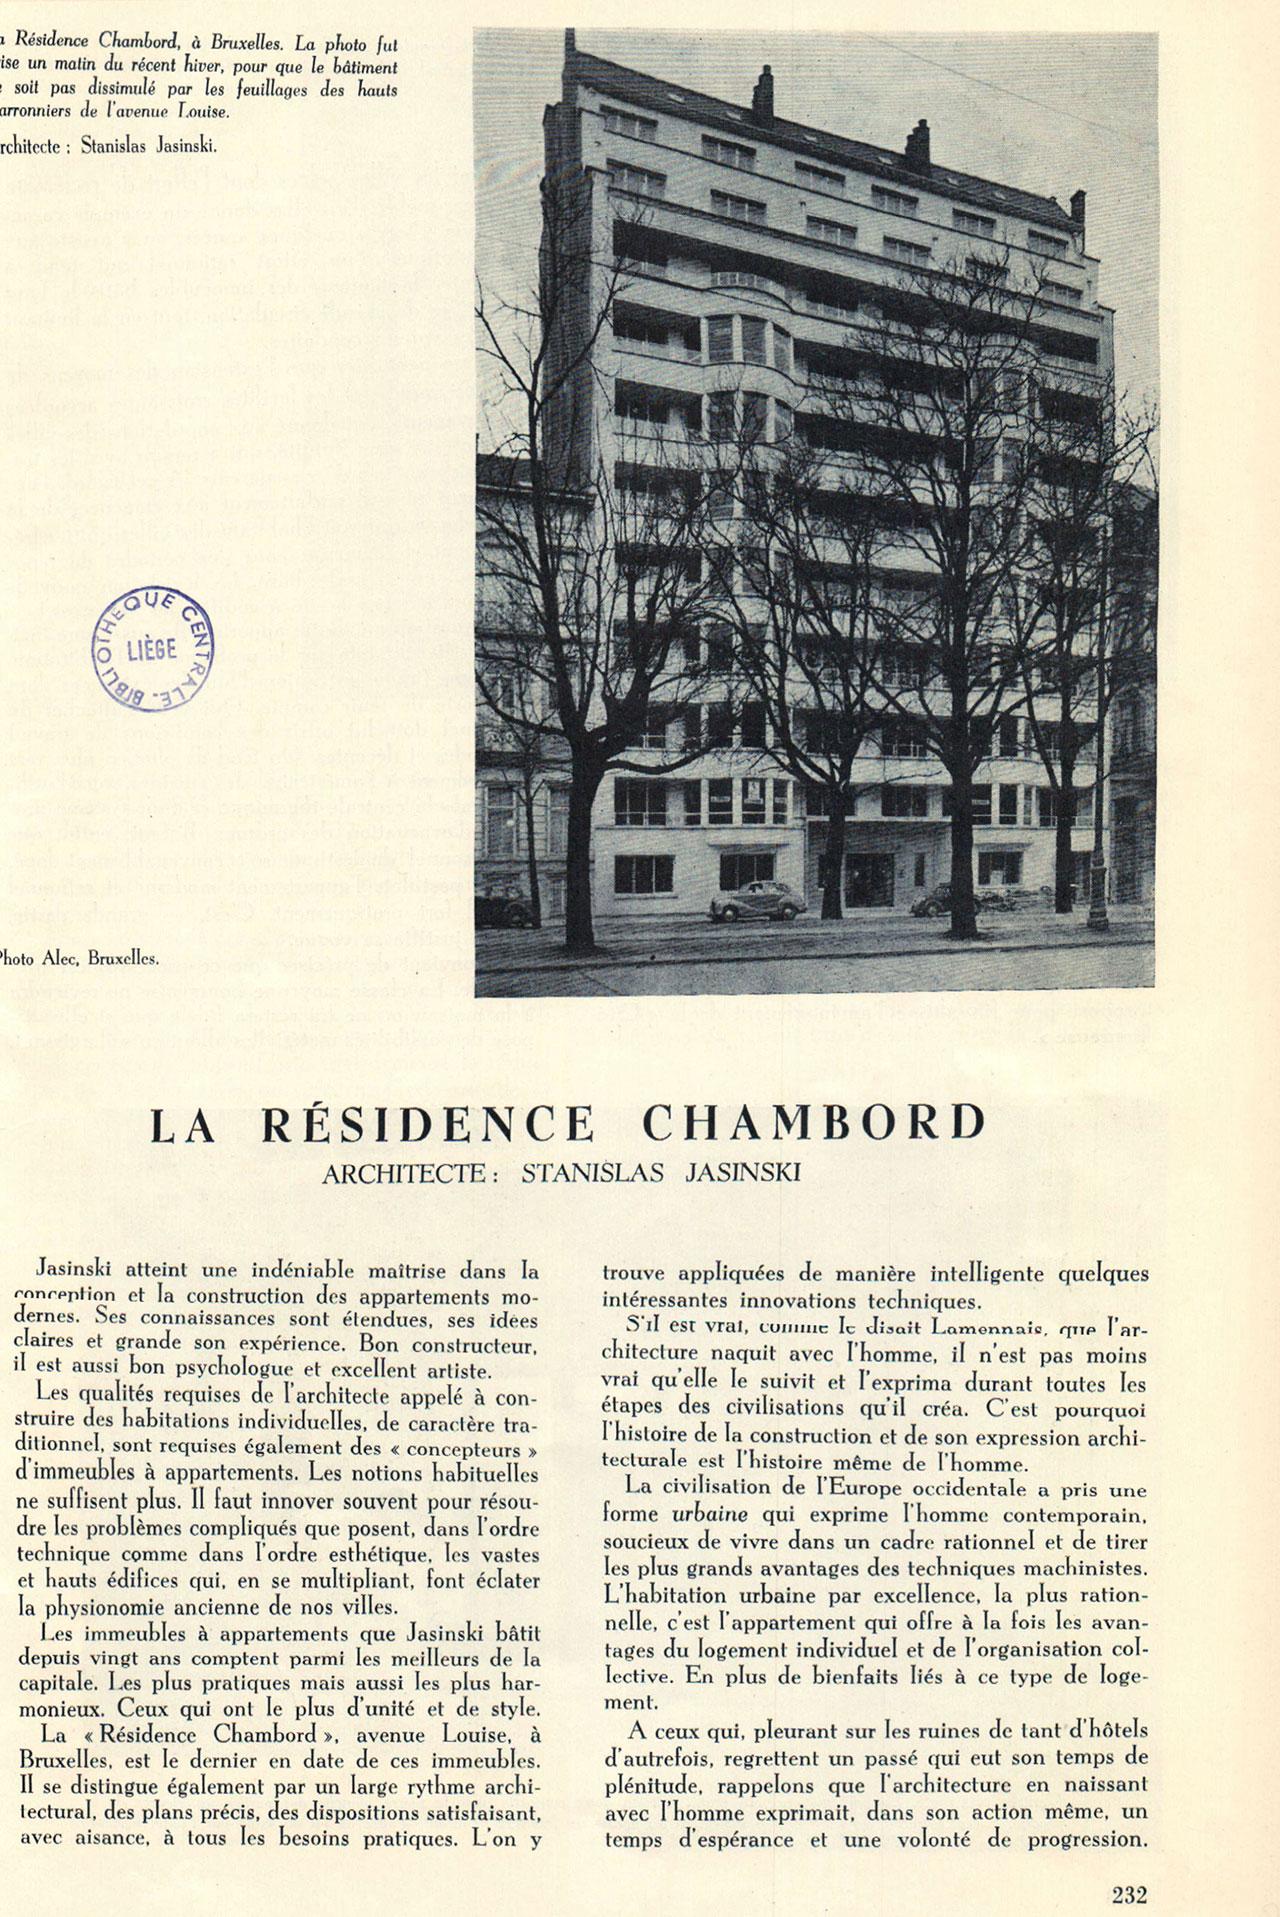 La résidence Chambord